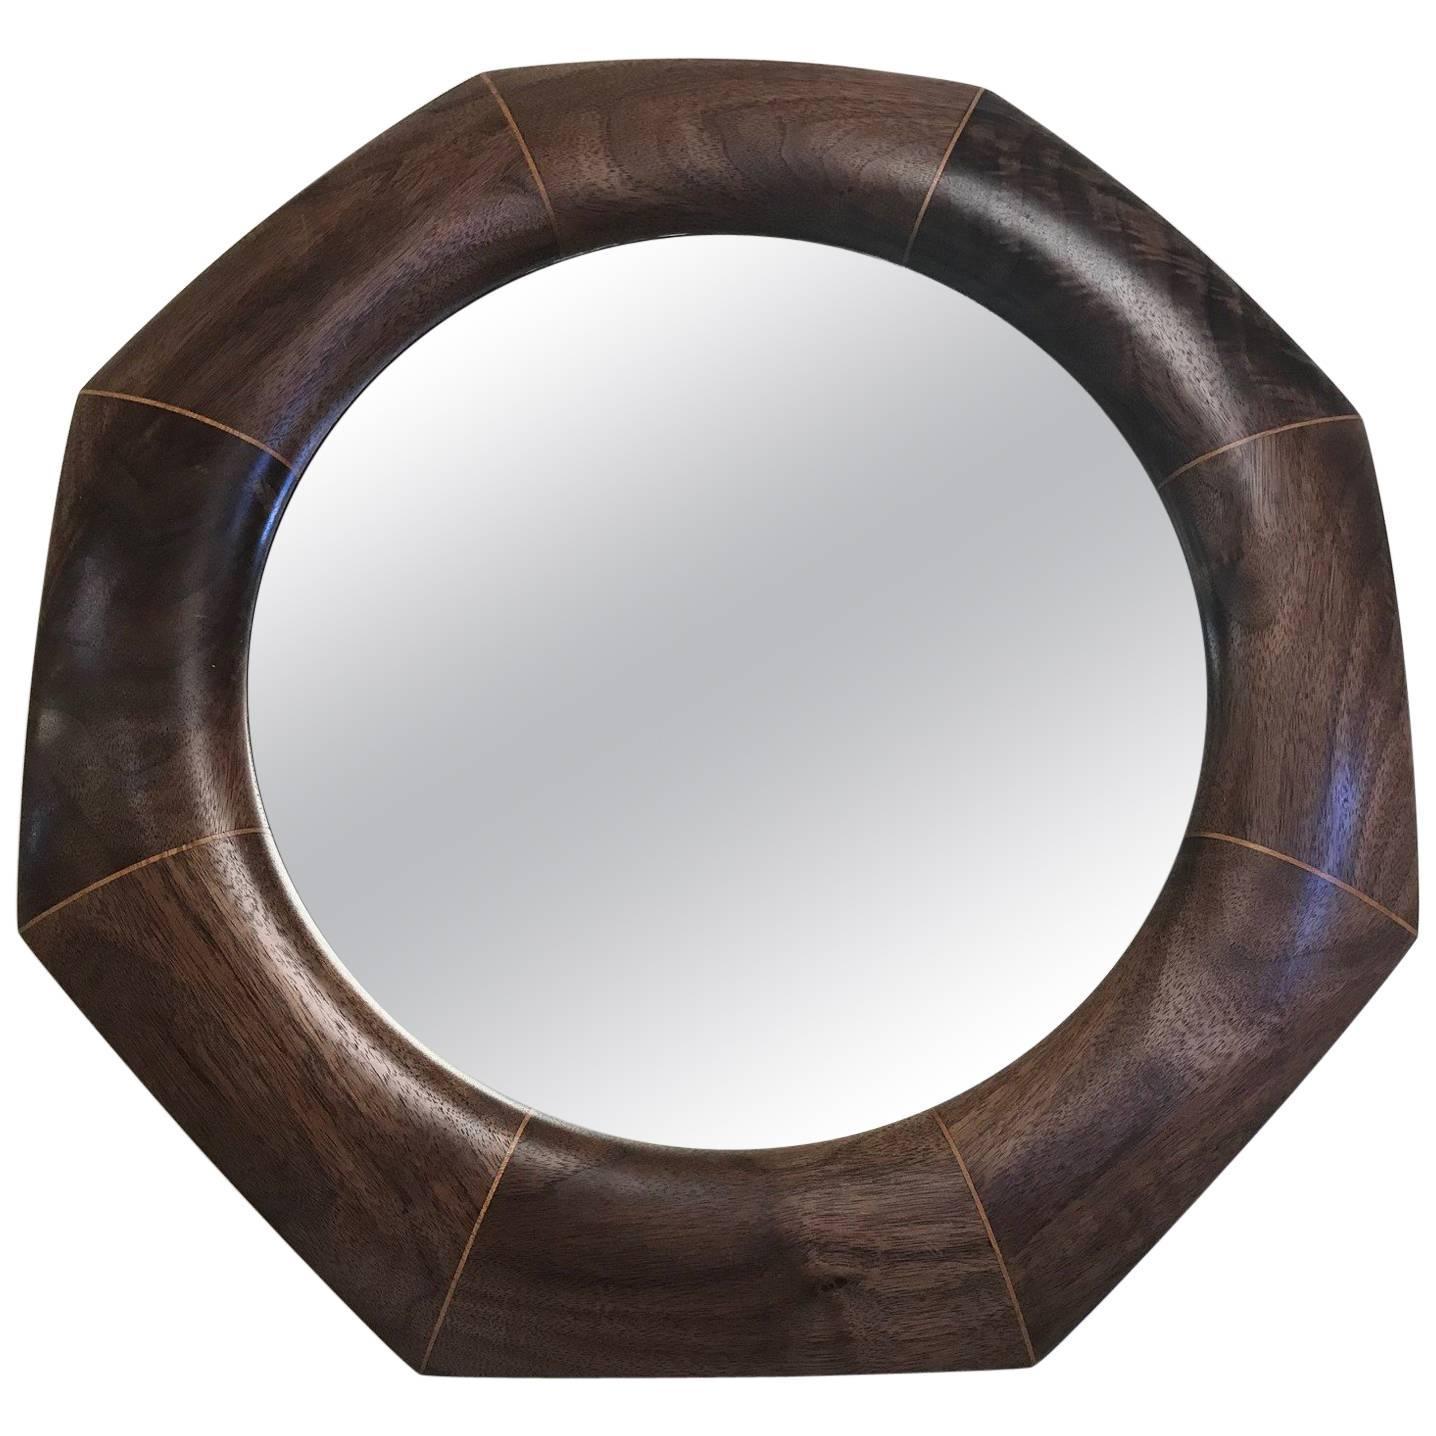 Custom Solid Walnut Octagonal Mirror